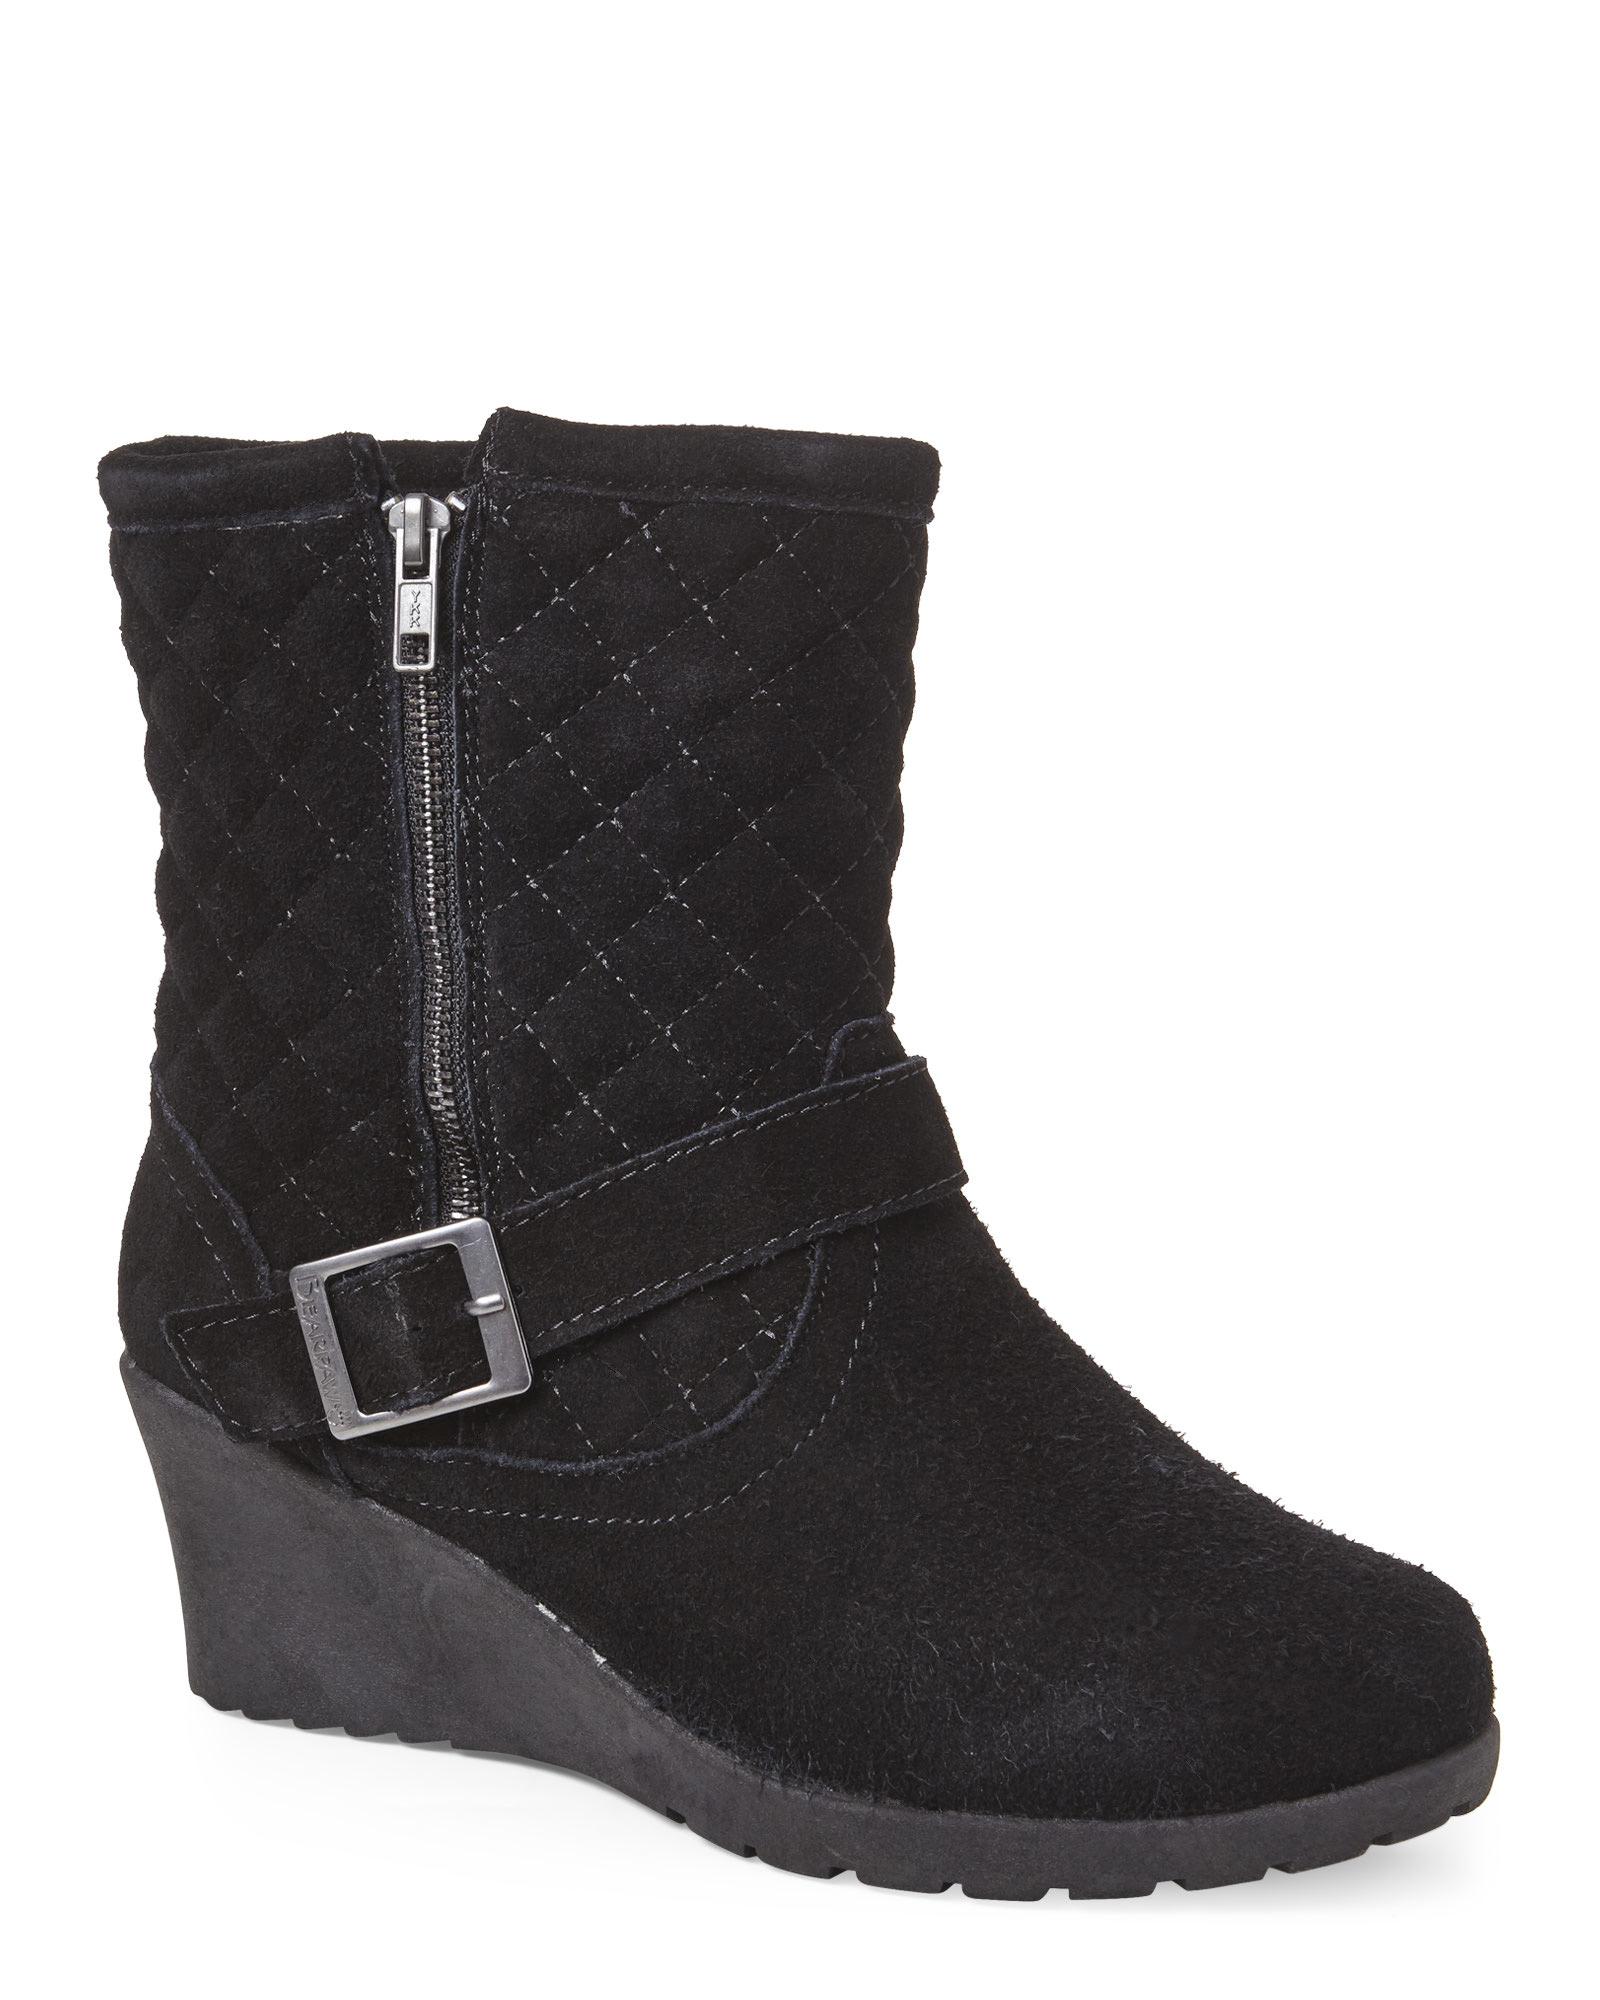 5ec8f7728b0 Lyst - BEARPAW Black Natasha Quilted Wedge Boots in Black